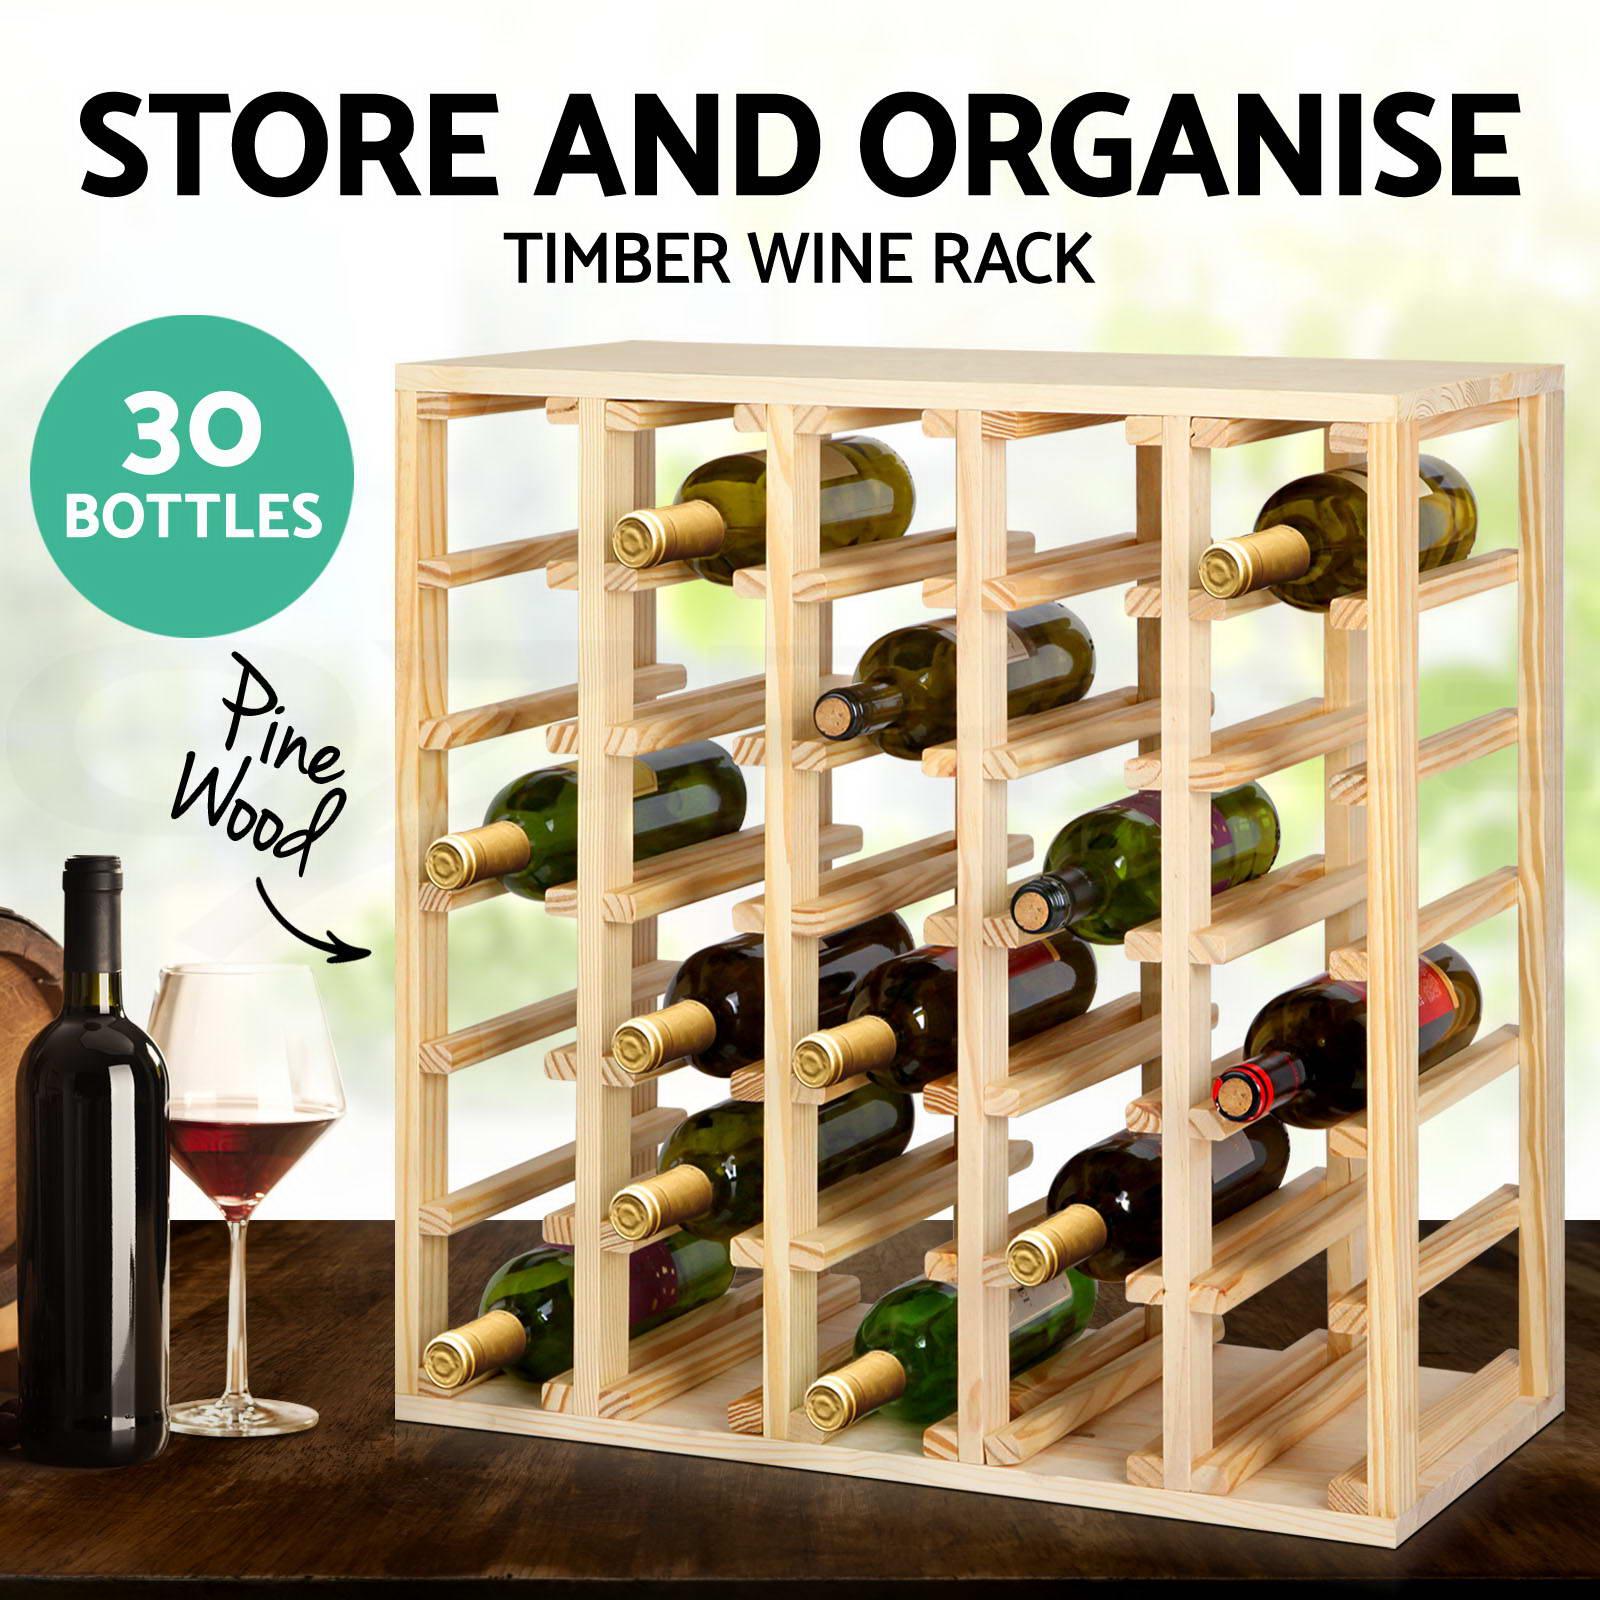 Timber-Wine-Rack-Wooden-Storage-Organiser-Stand-7-12-20-24-30-42-72-110-Bottle